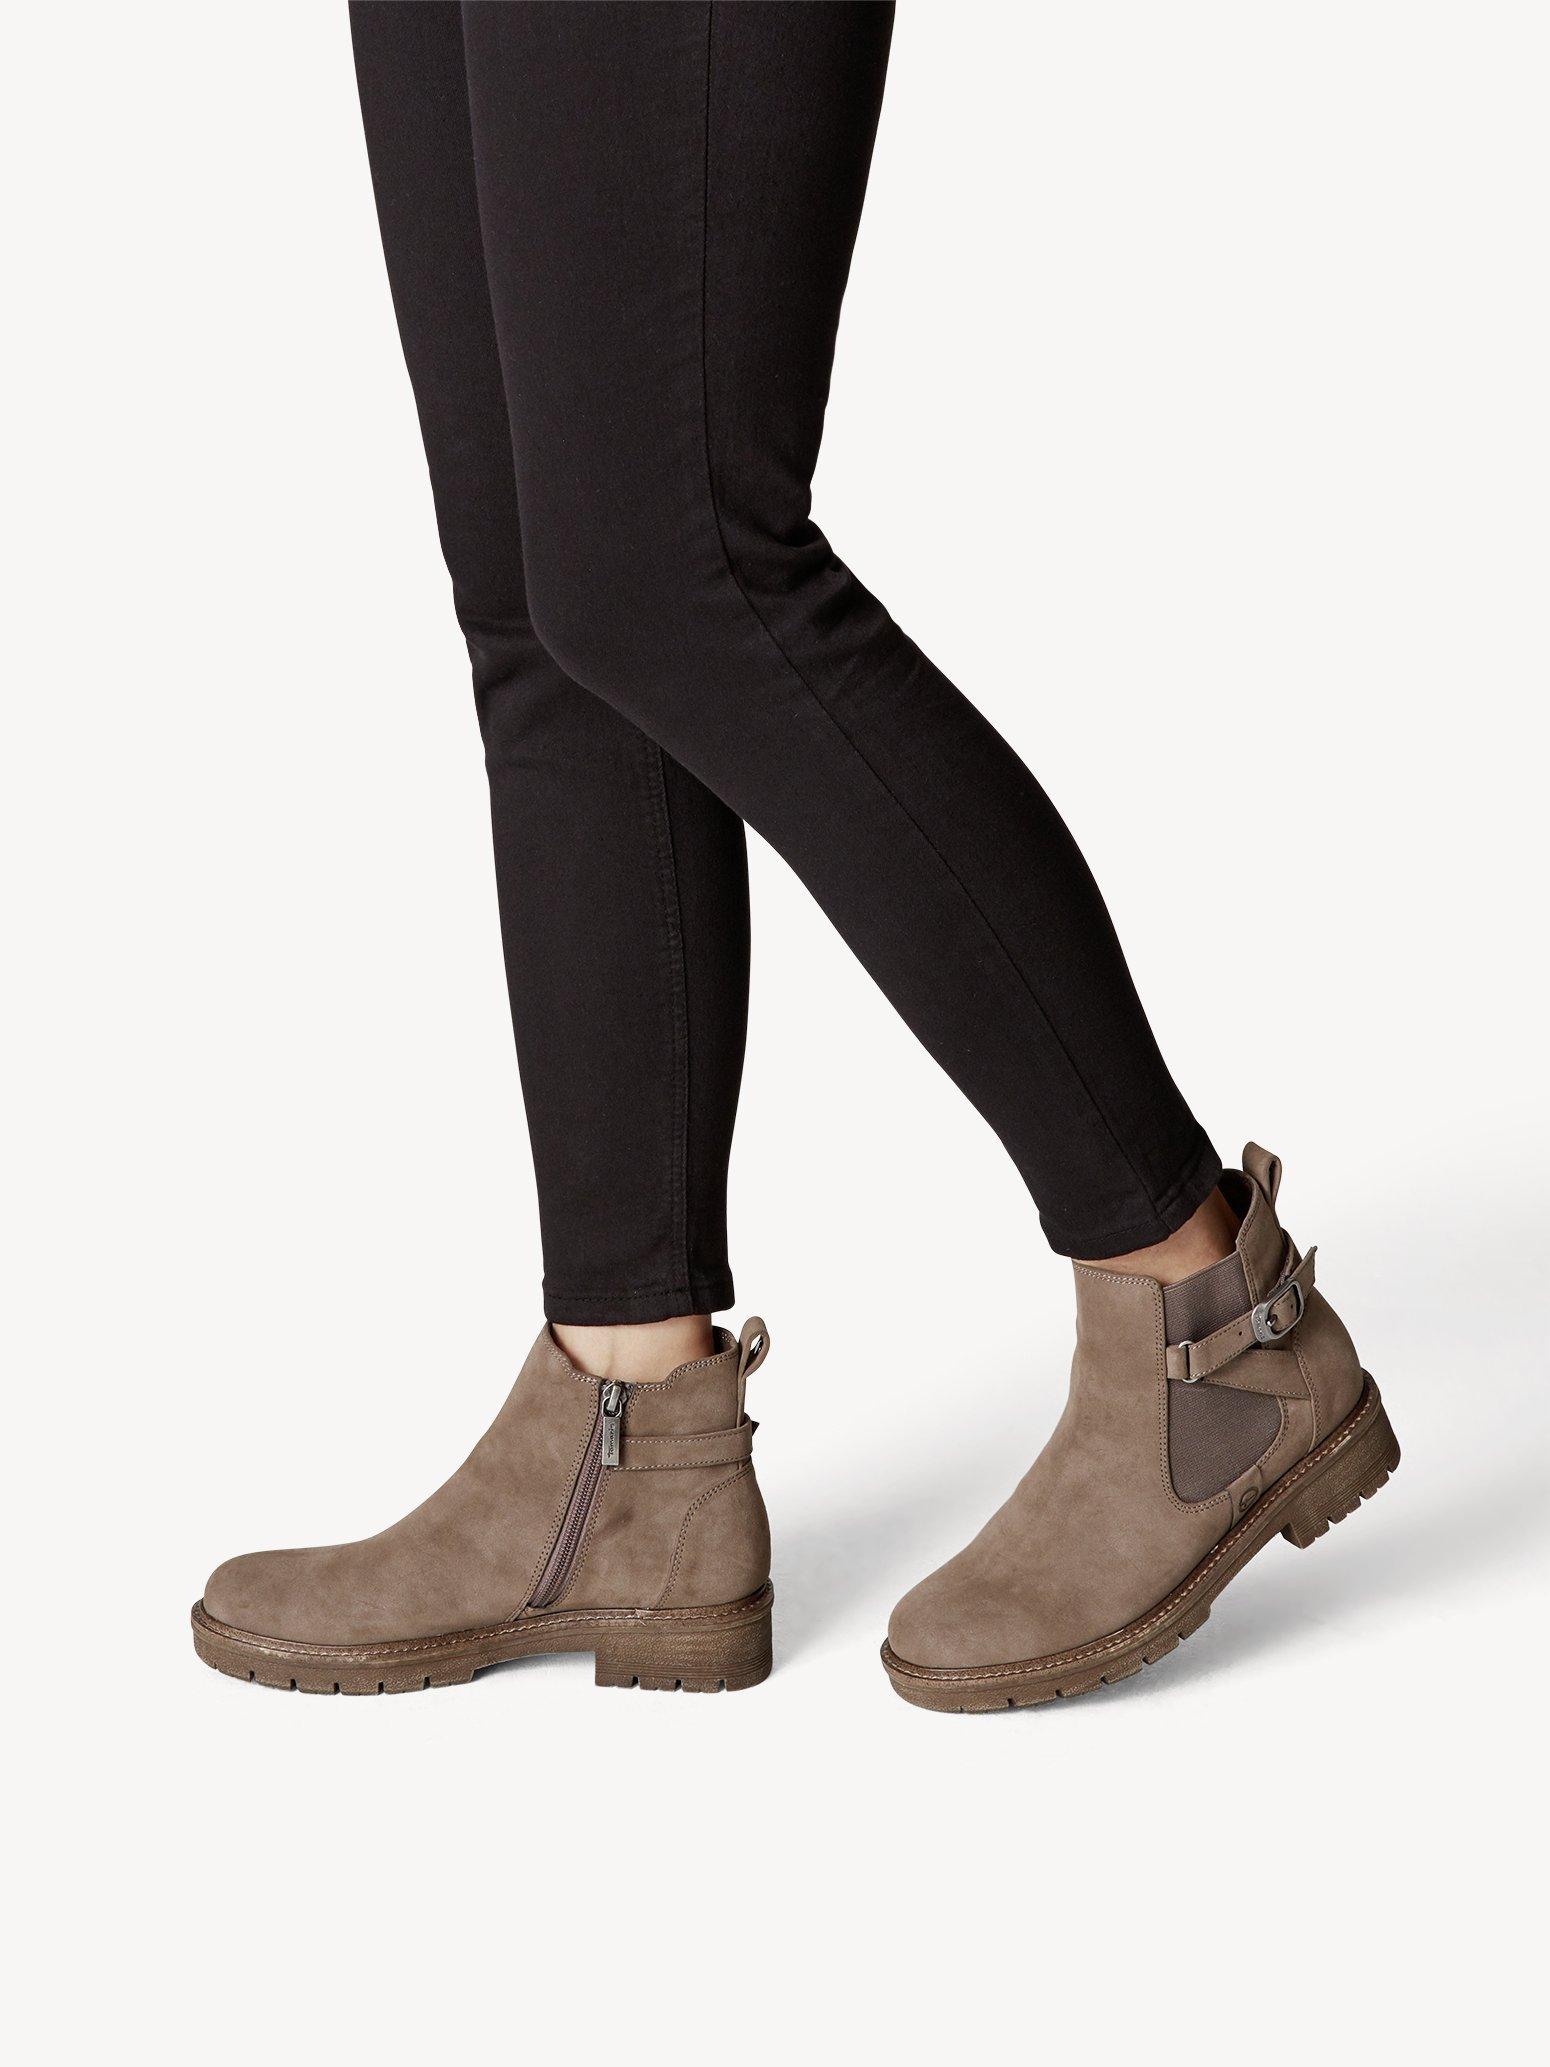 Ботинки Tamaris 1-1-25416-27-341